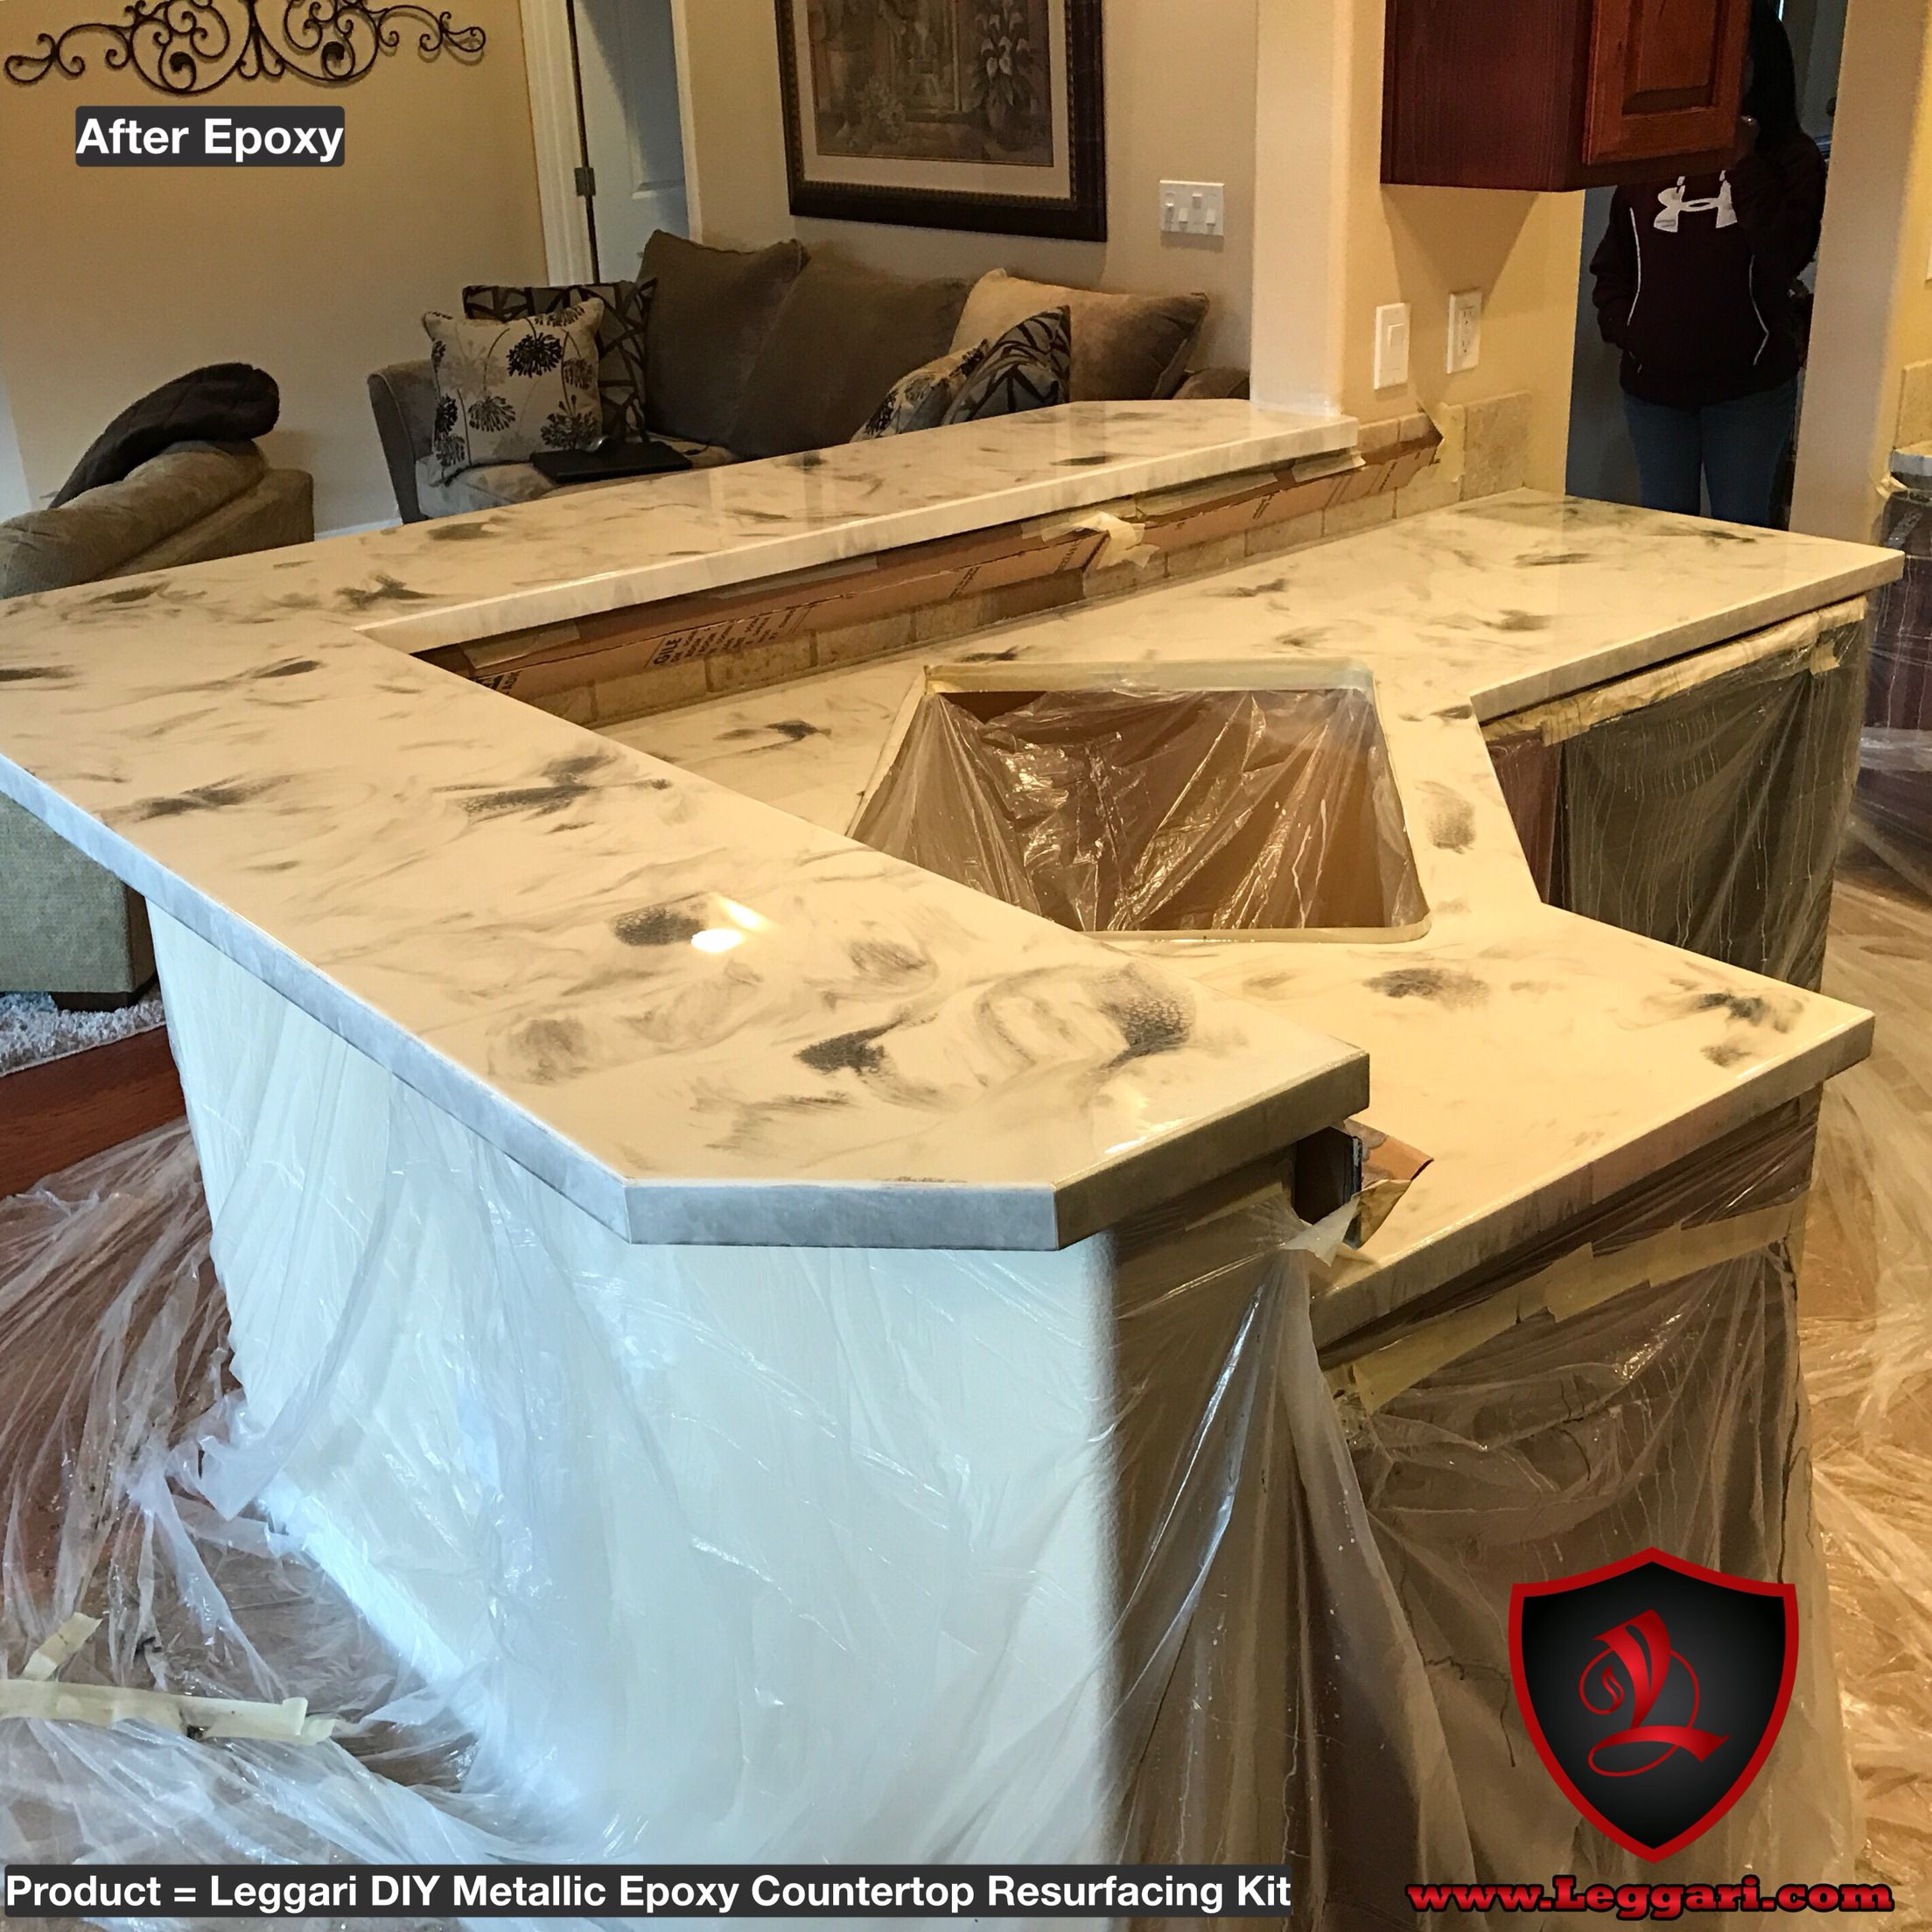 Diy Metallic Epoxy Countertop Kit Installed In A Kitchen